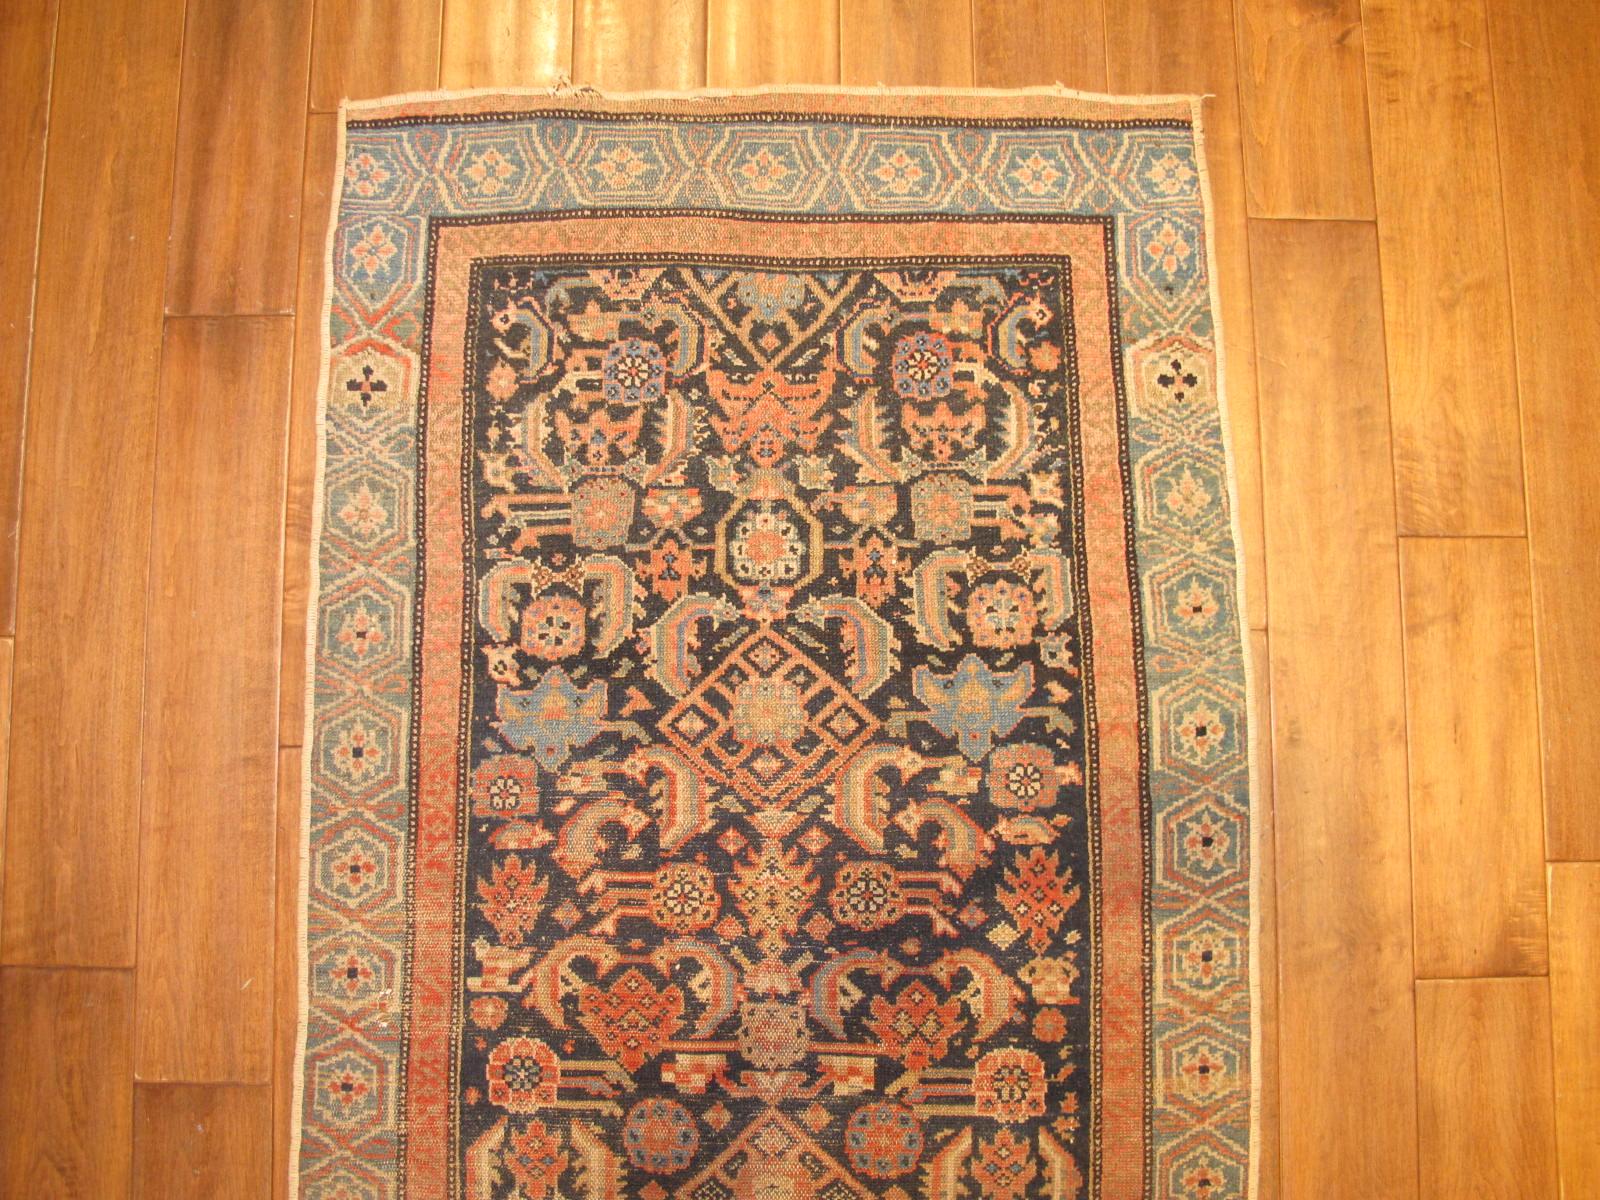 13099 antique persian malayer runner 2,9 x 10,4 (2)